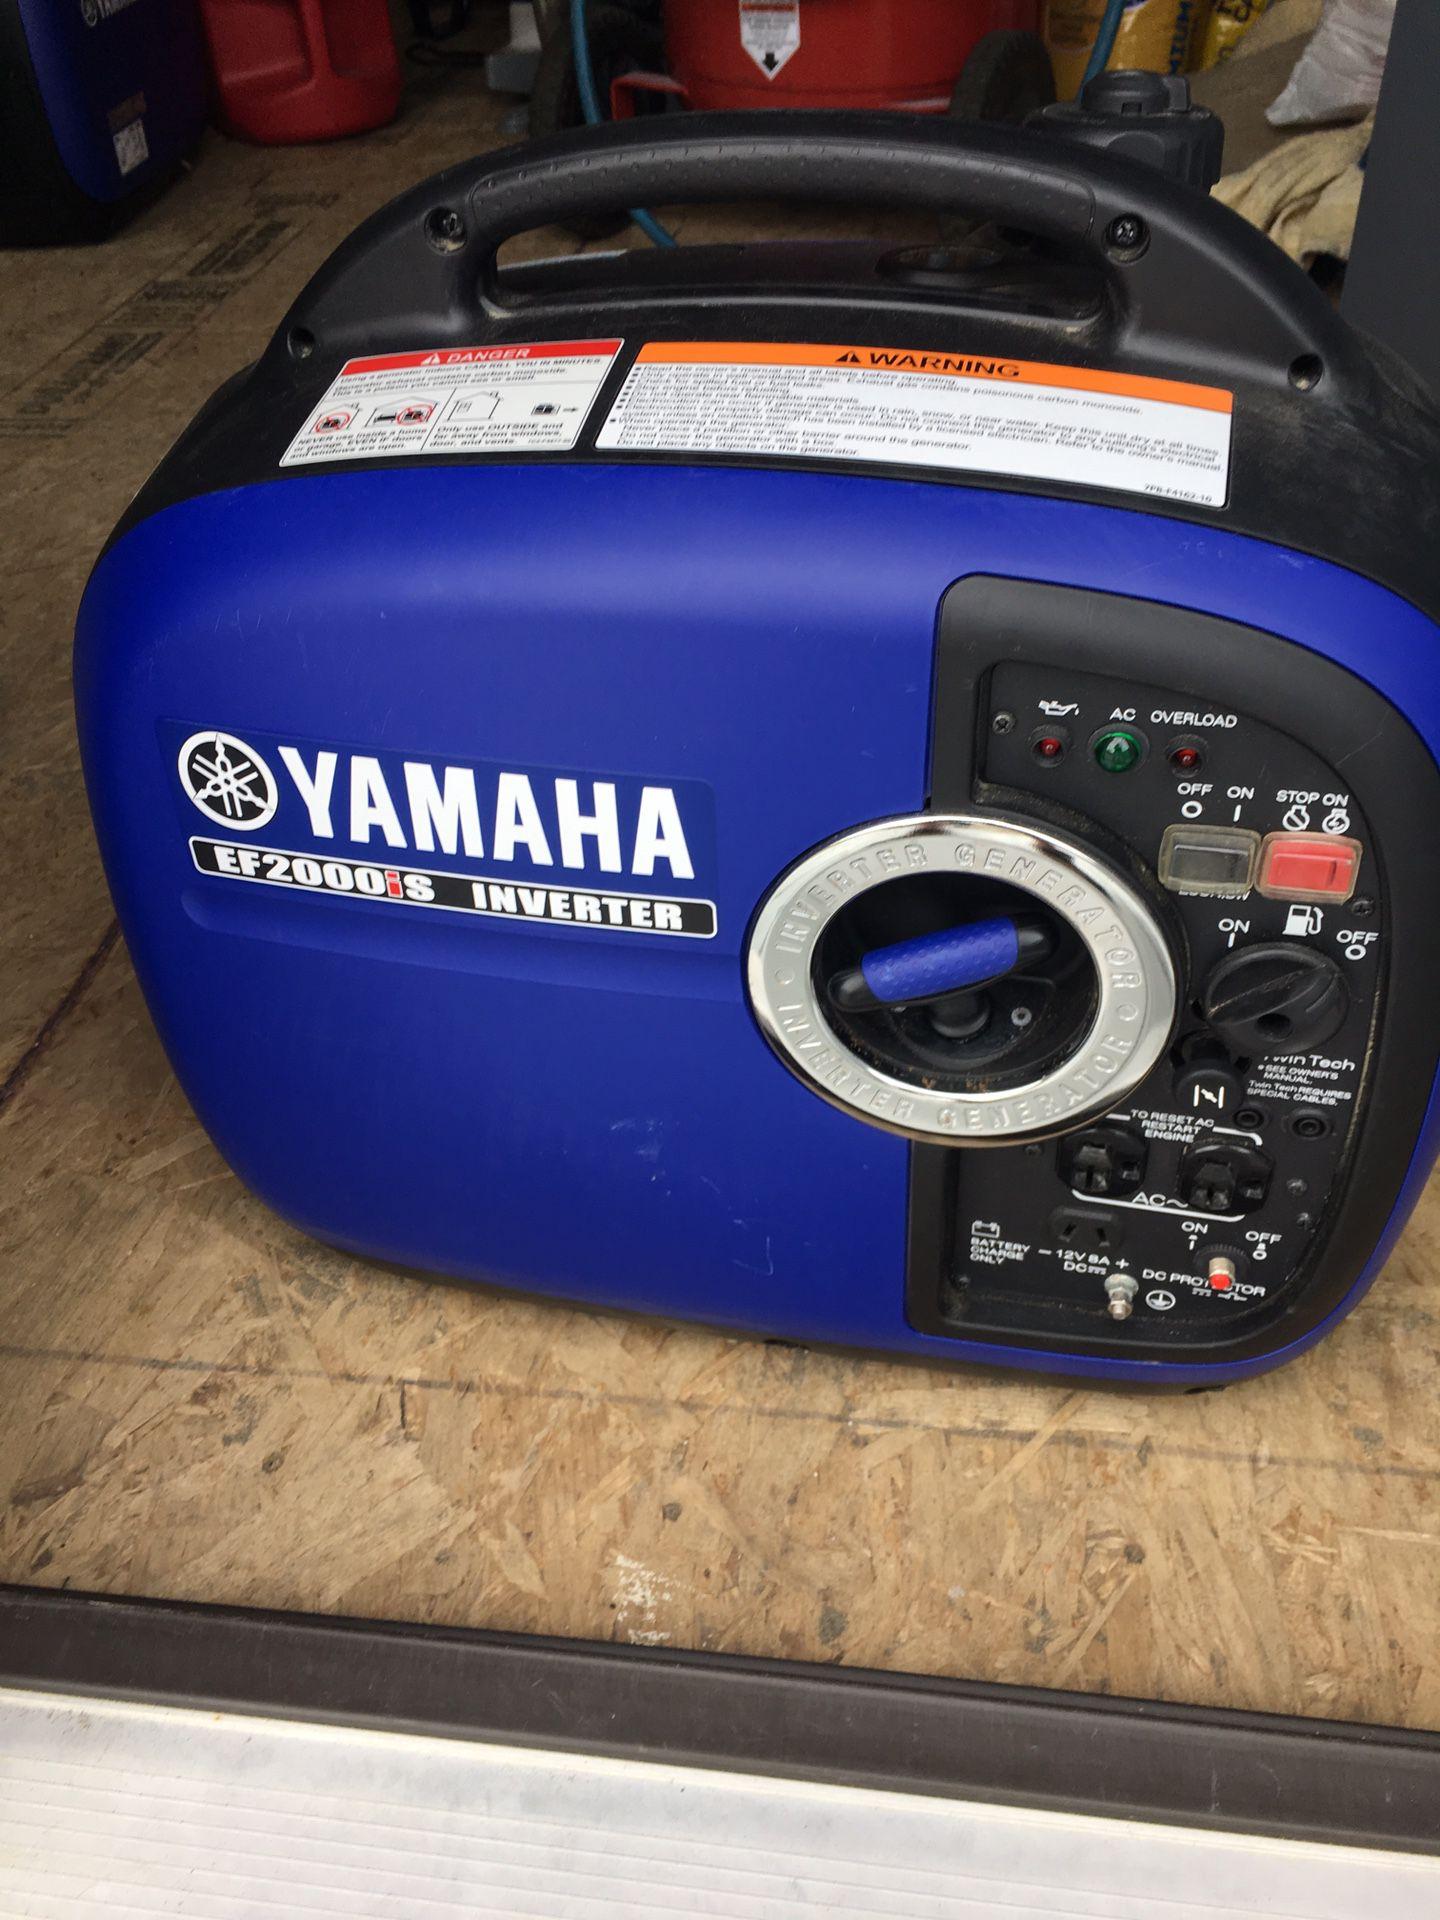 Yamaha EF 2000is 700.00